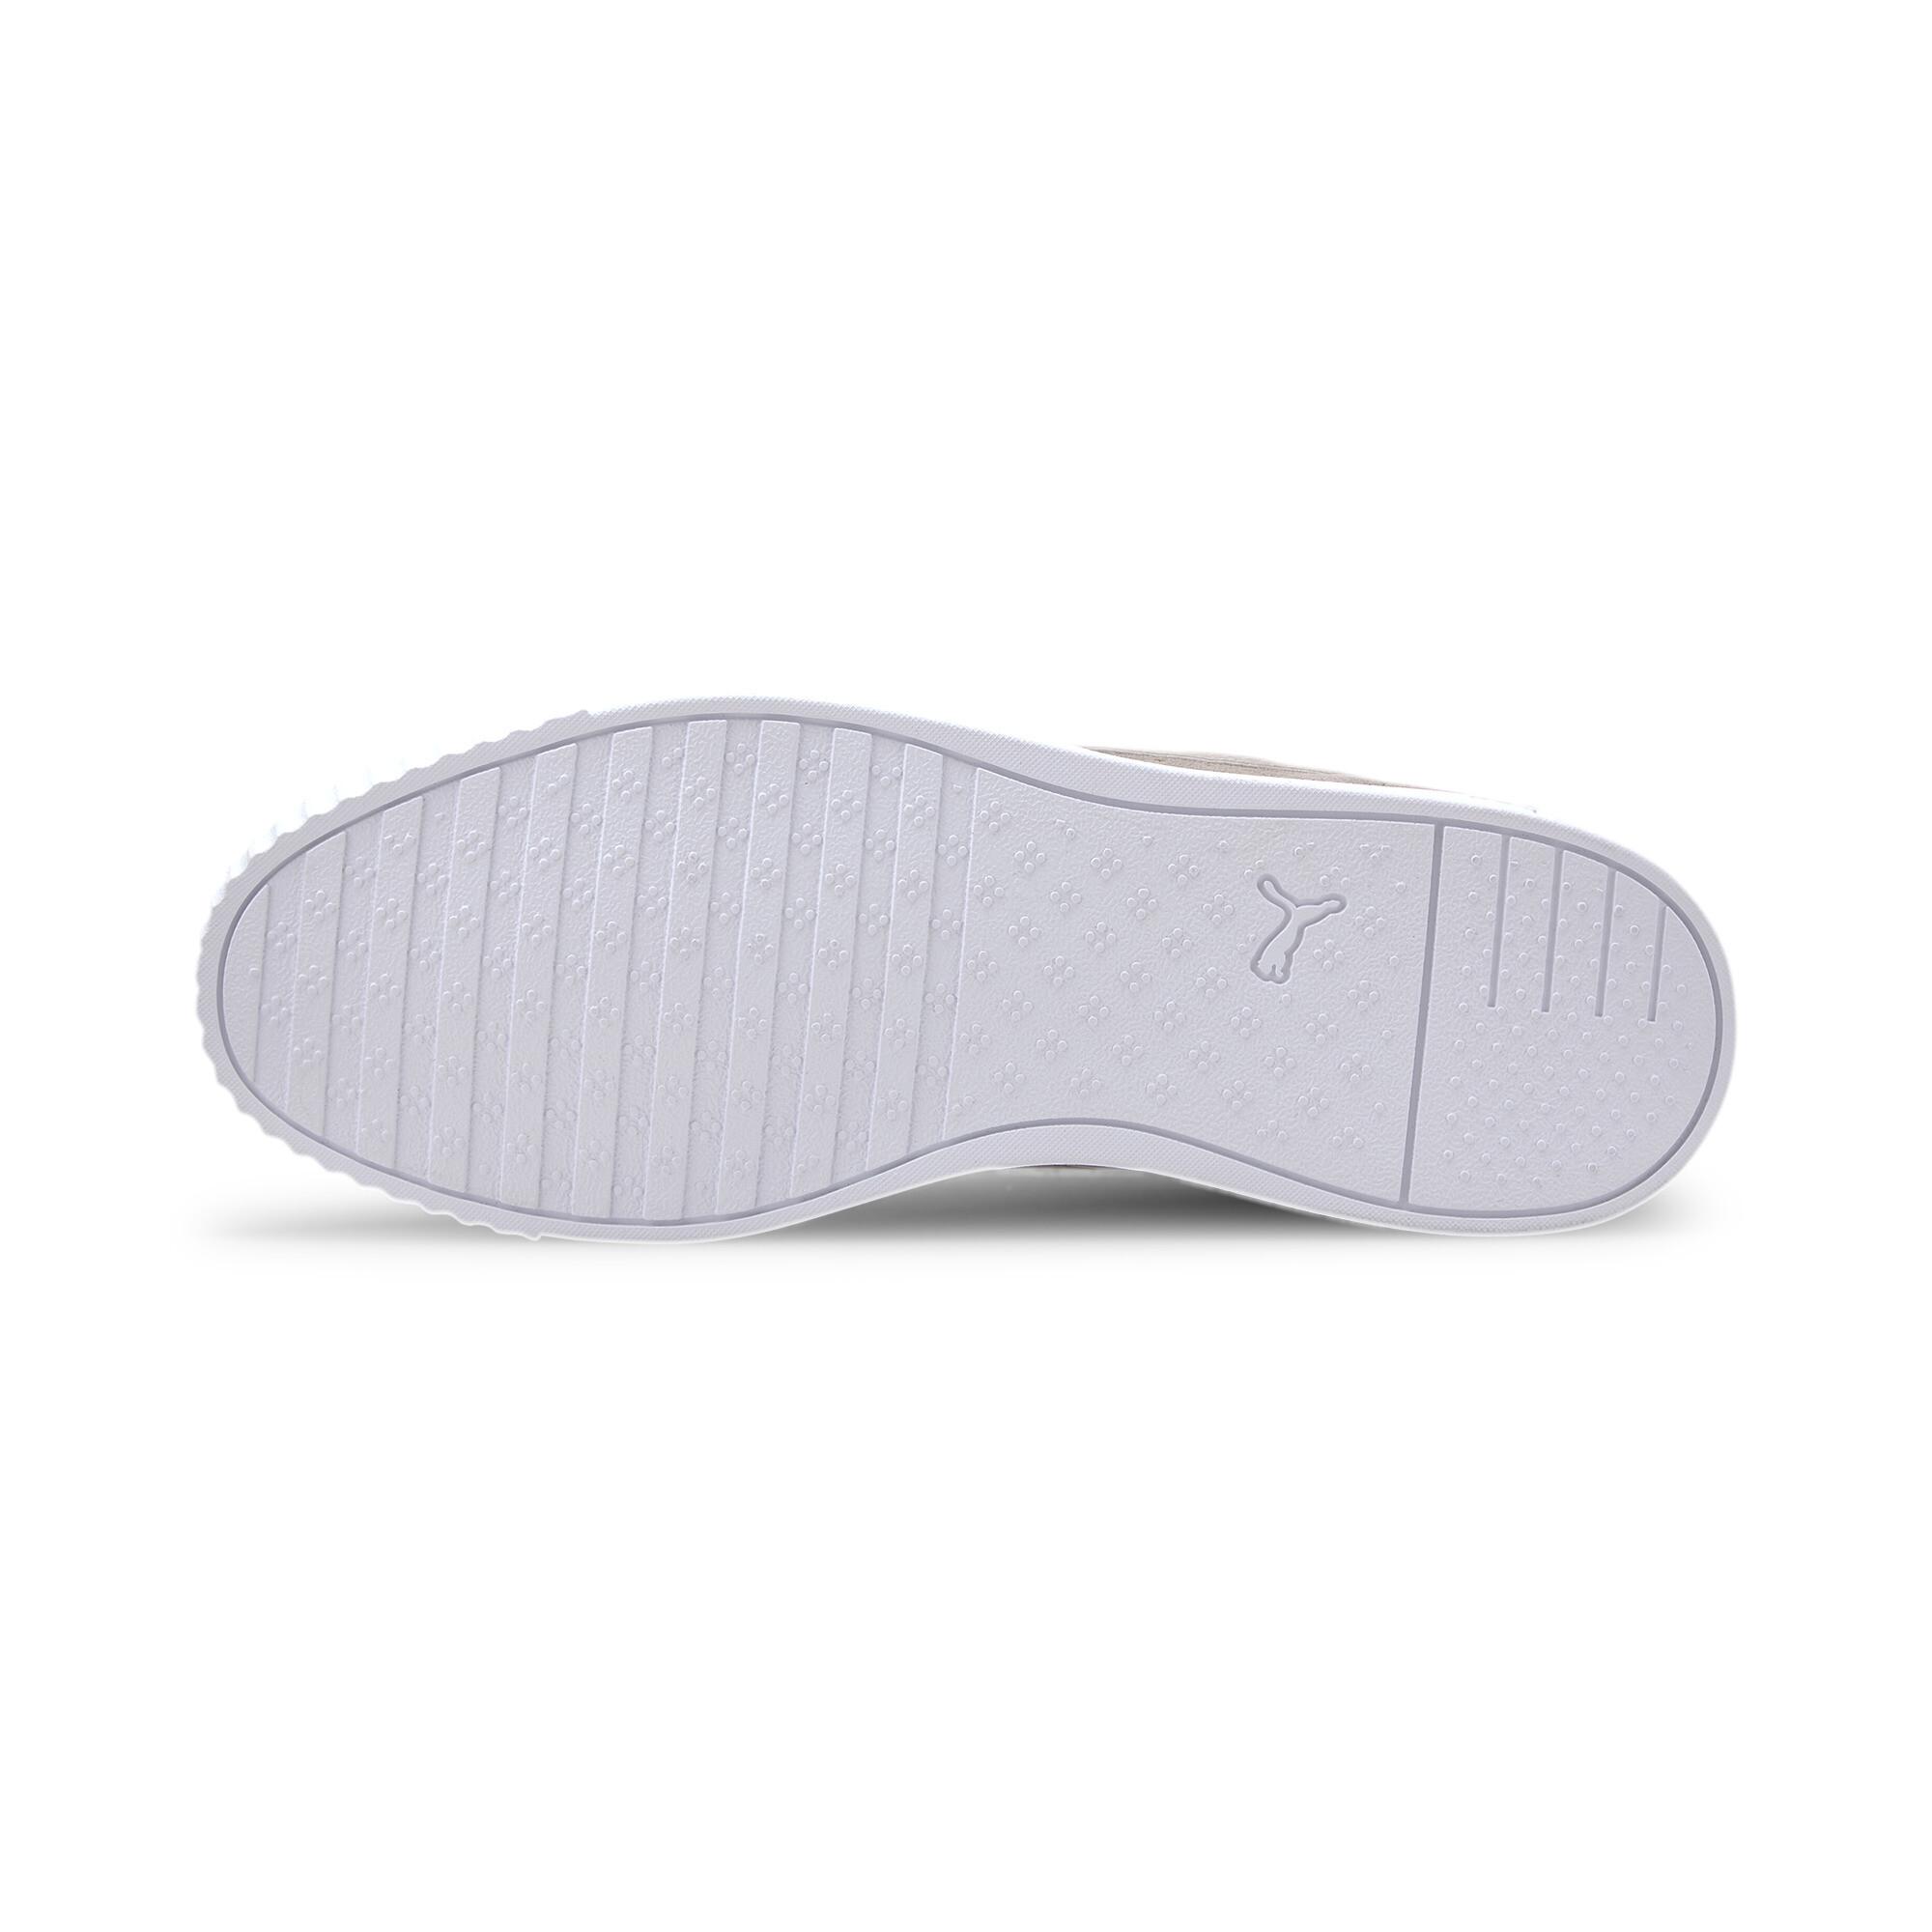 PUMA-Women-039-s-Carina-Slim-Suede-Sneakers thumbnail 6